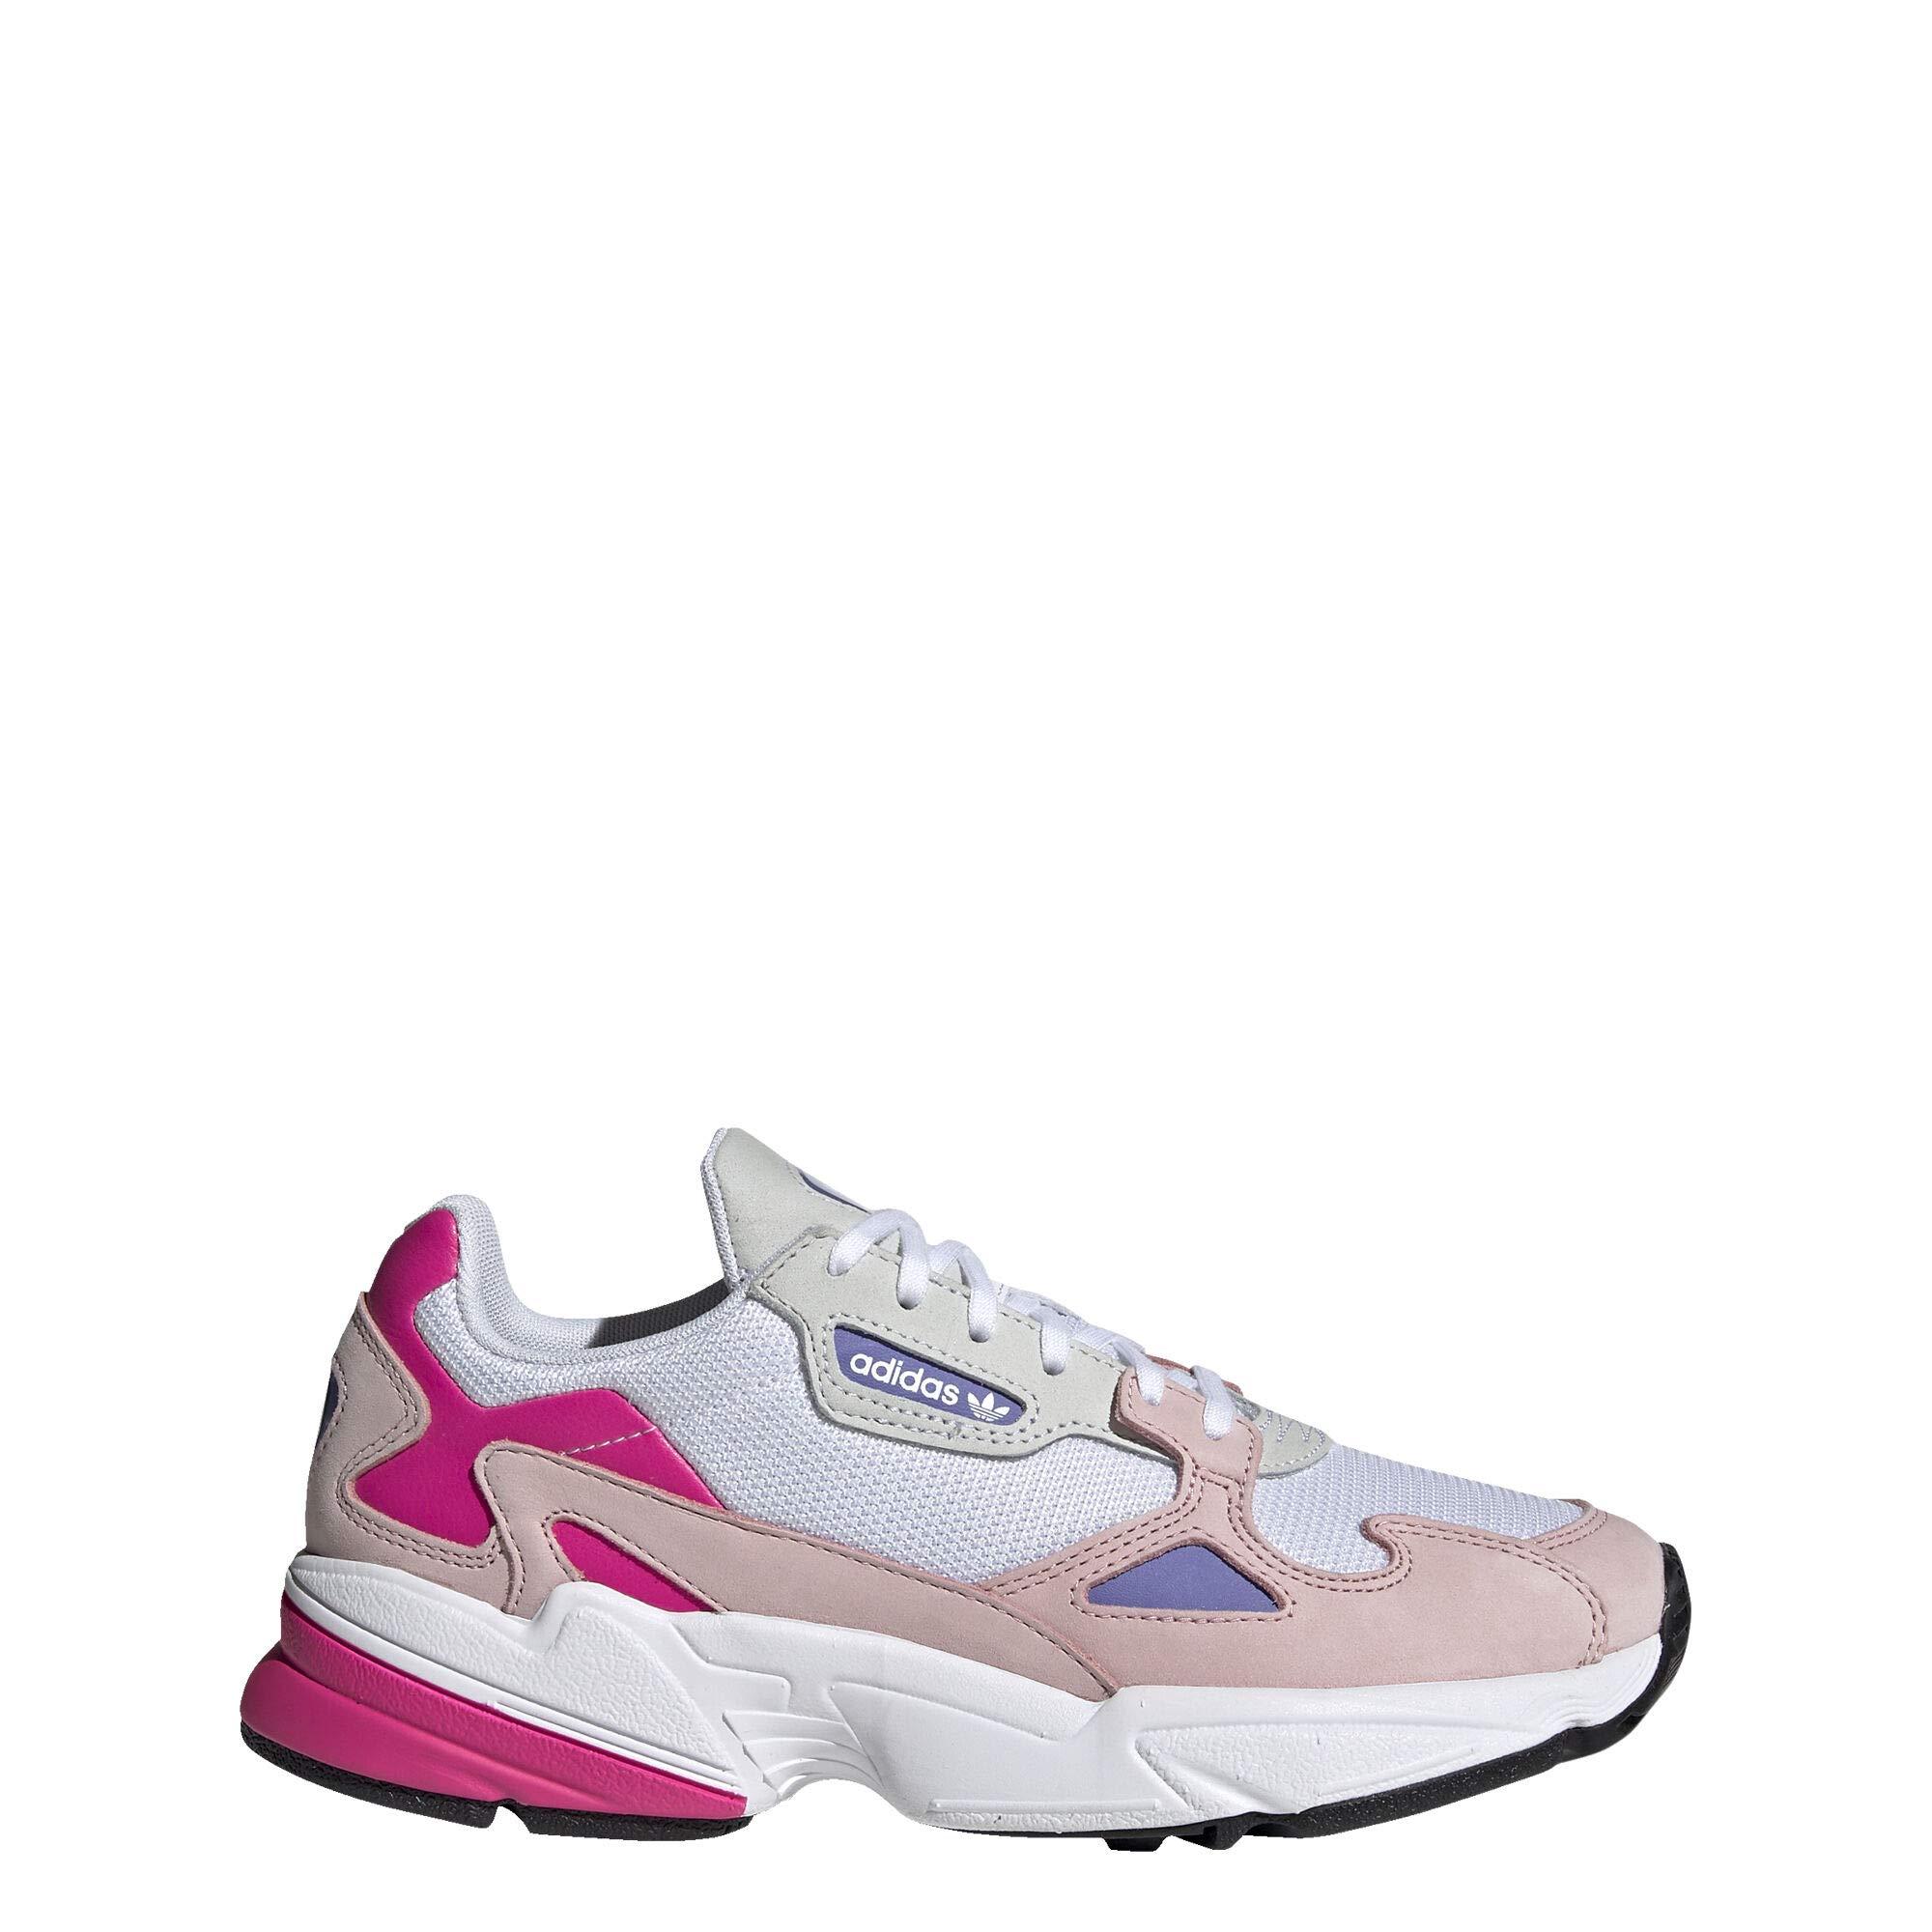 adidas Falcon Shoes Women's, White, Size 9